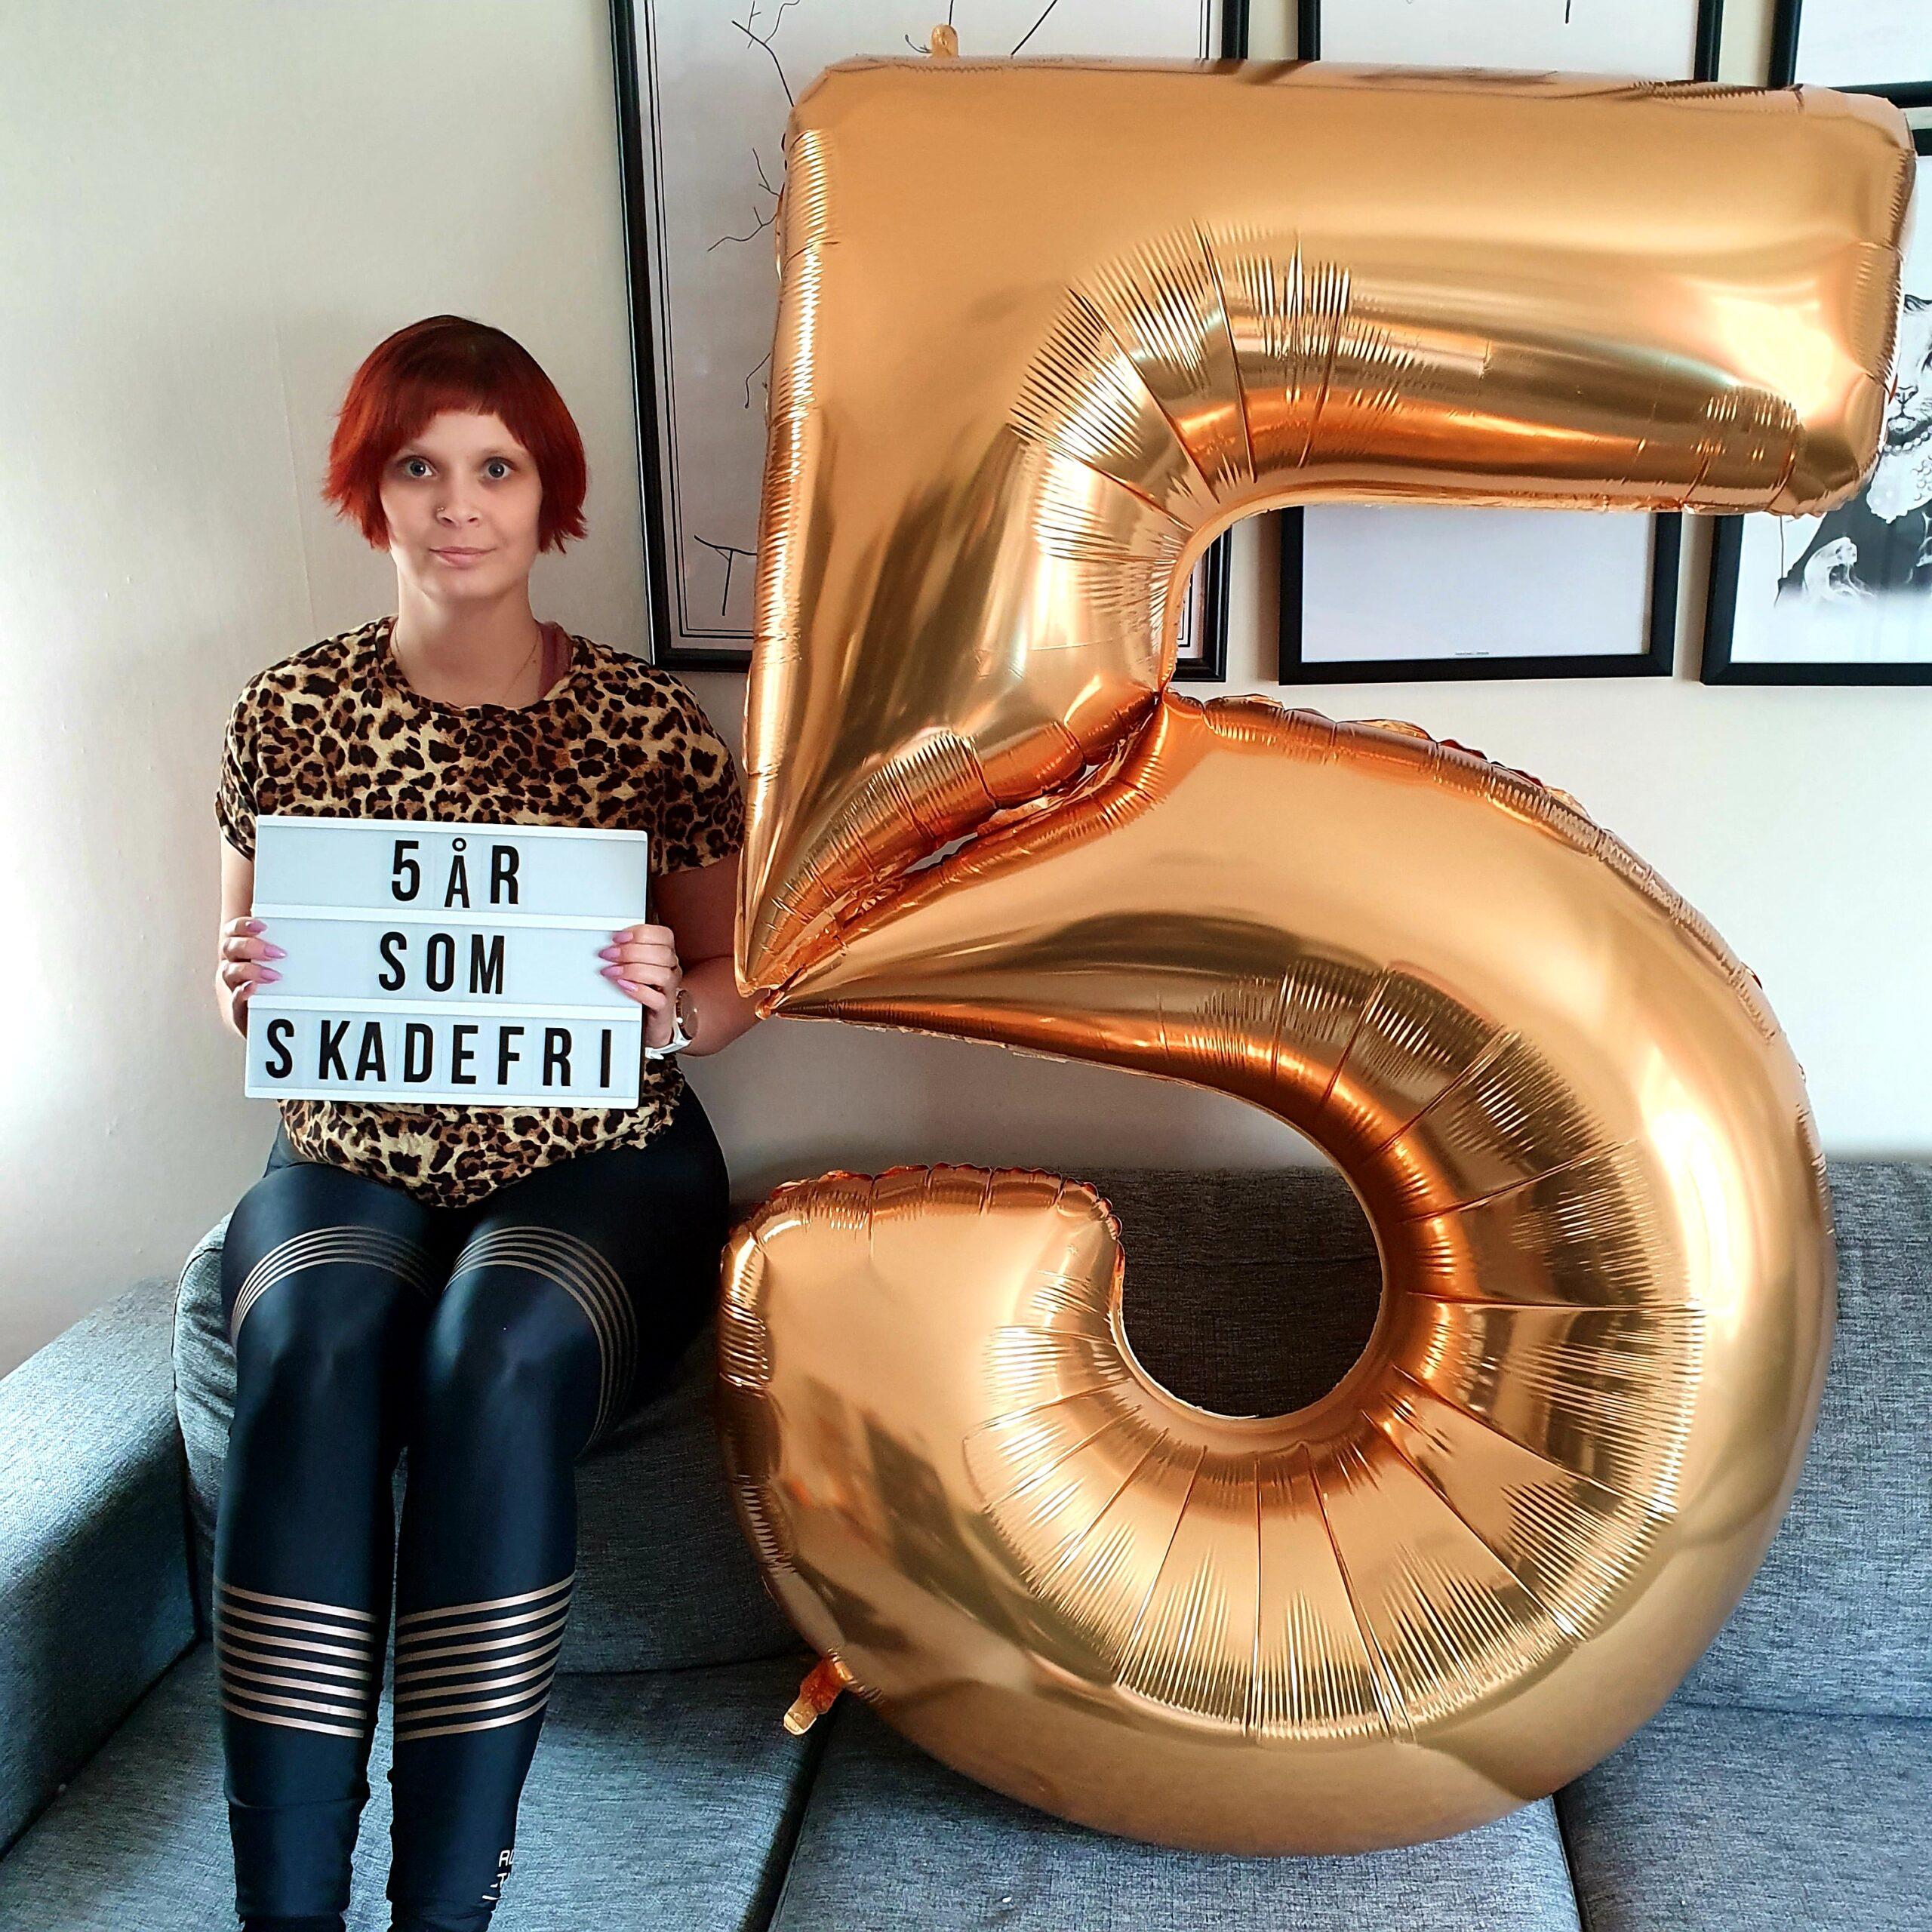 5 år utan självskadebeteende